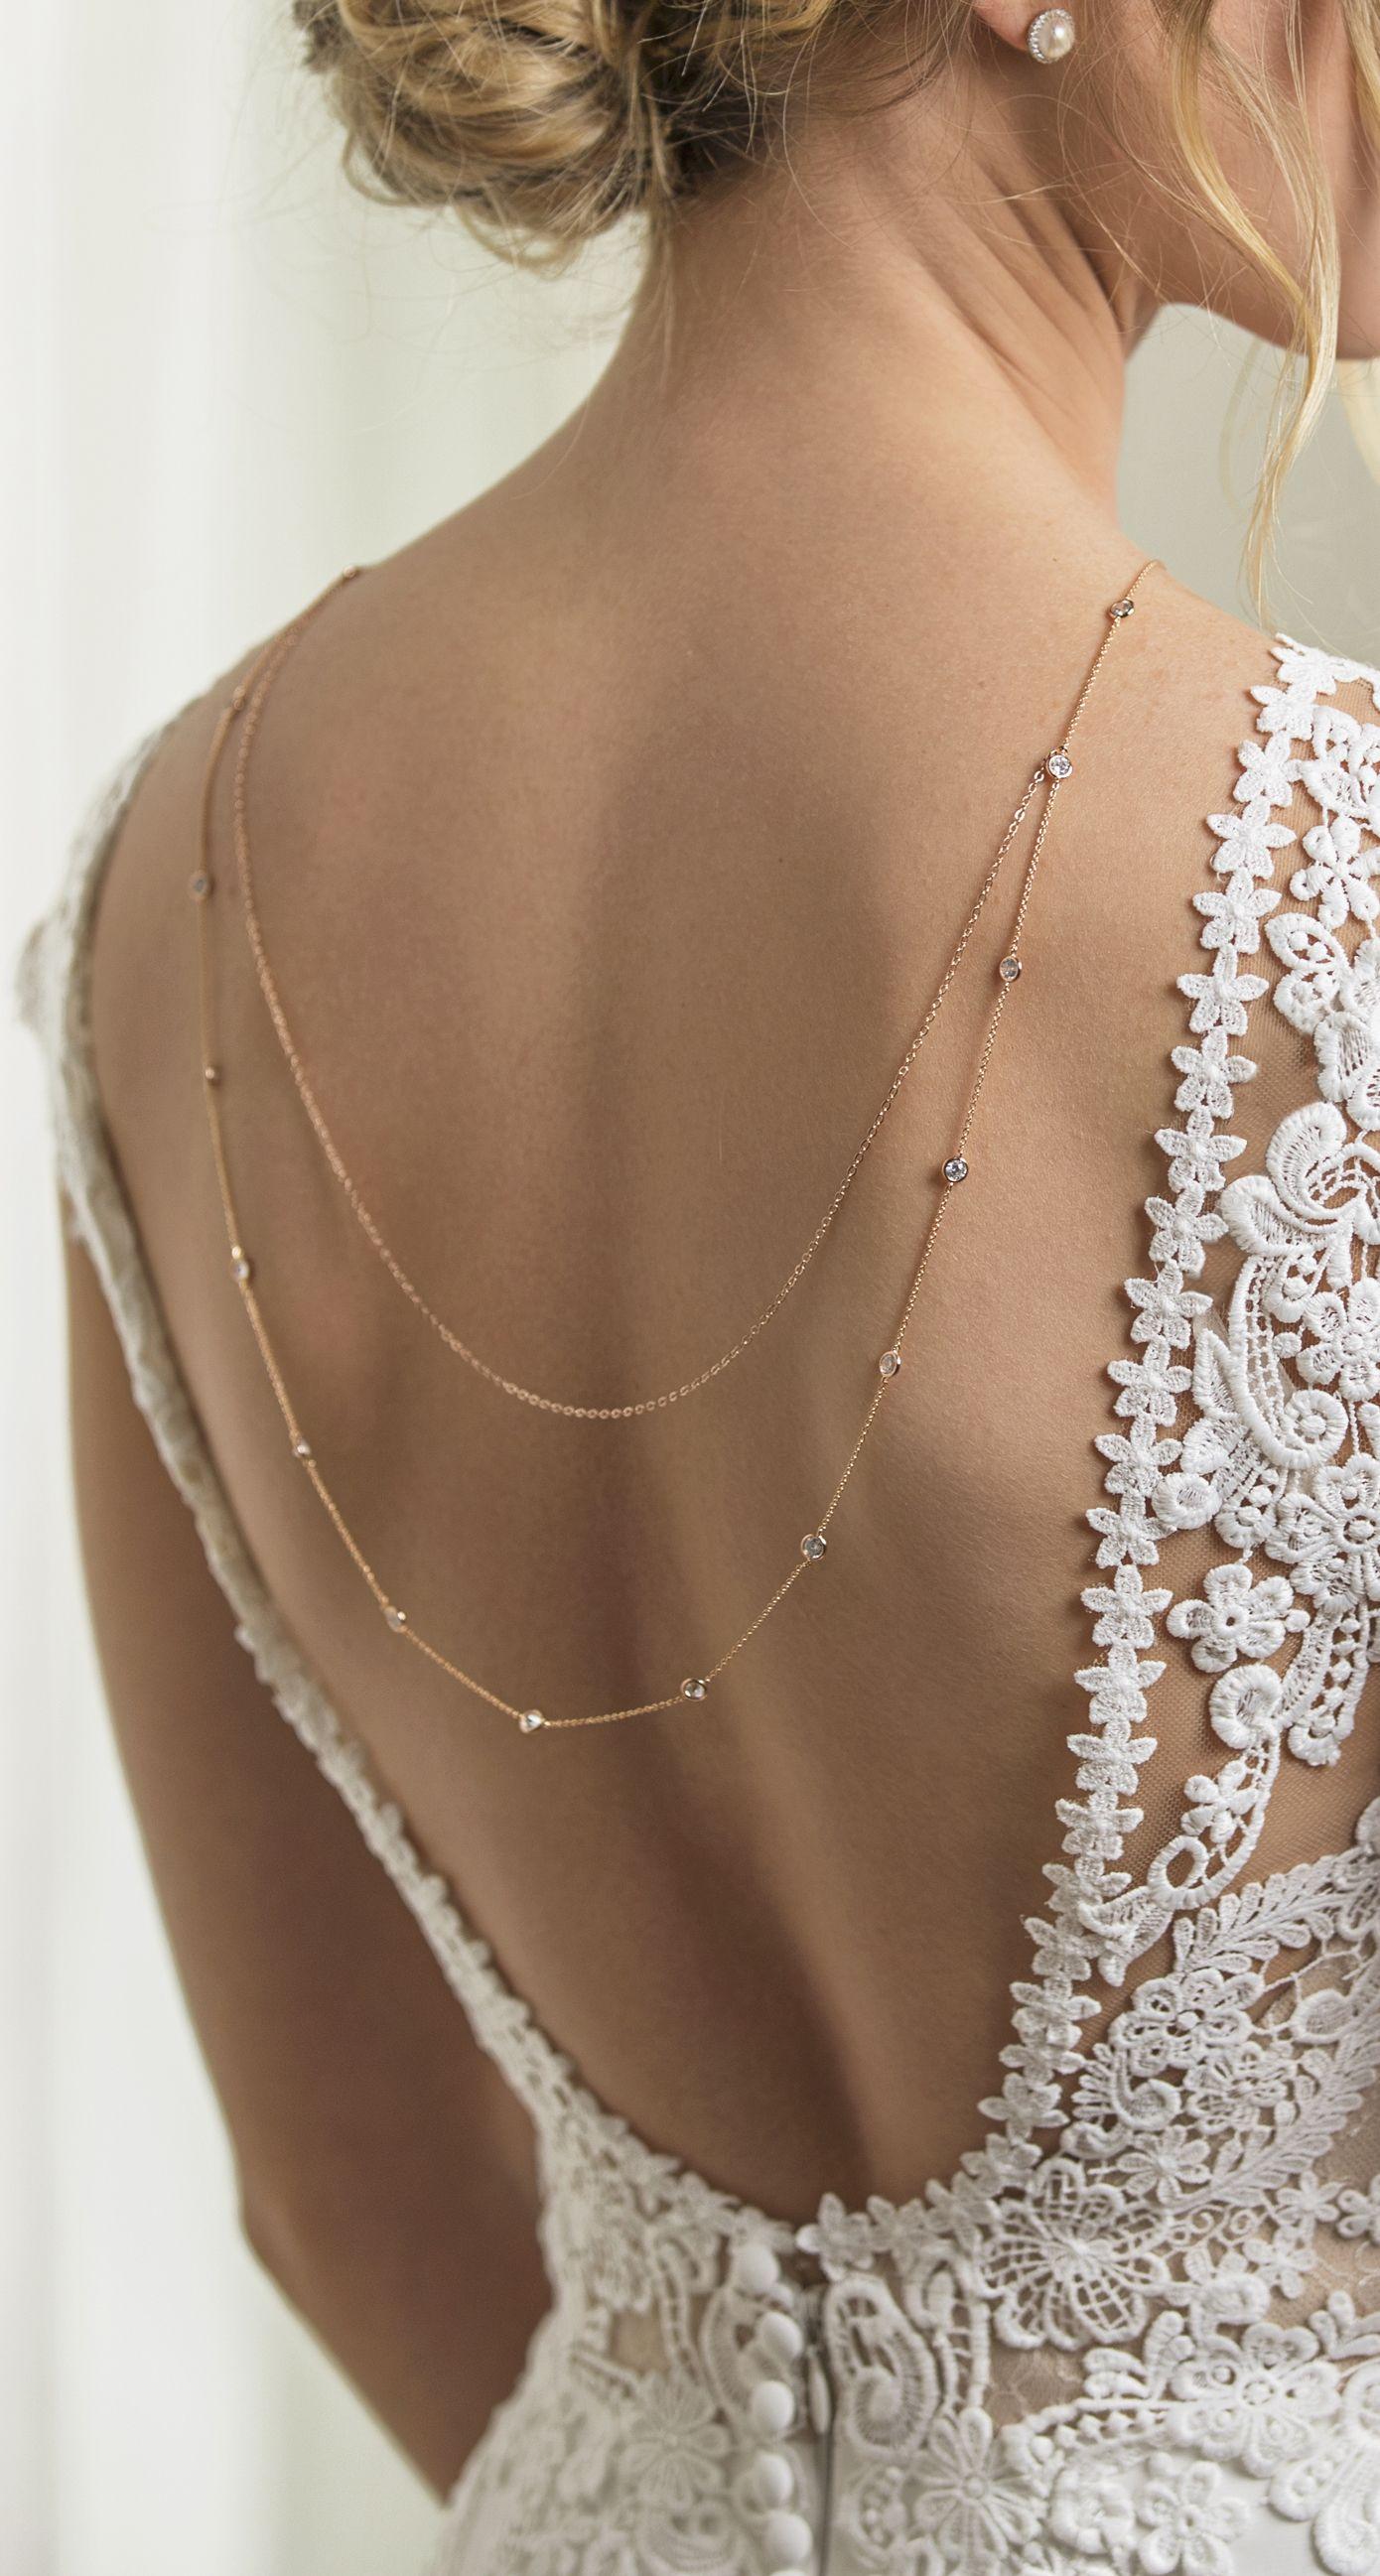 Dakota u crystal back necklace pinterest backdrops dream